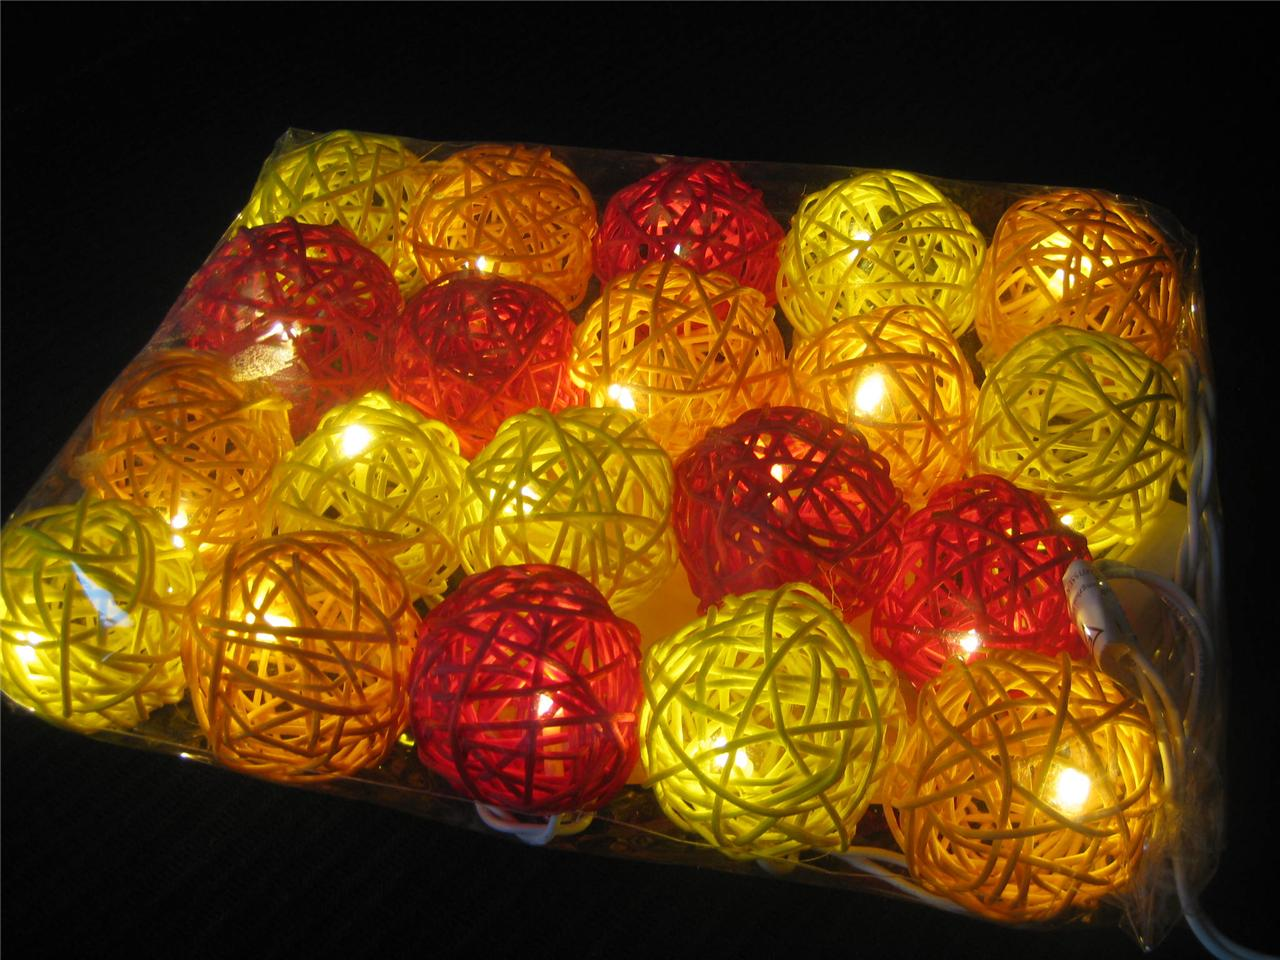 20 SUNSET Wicker Rattan Ball BATTERY Operated LED String Fairy Lights Red Orange eBay